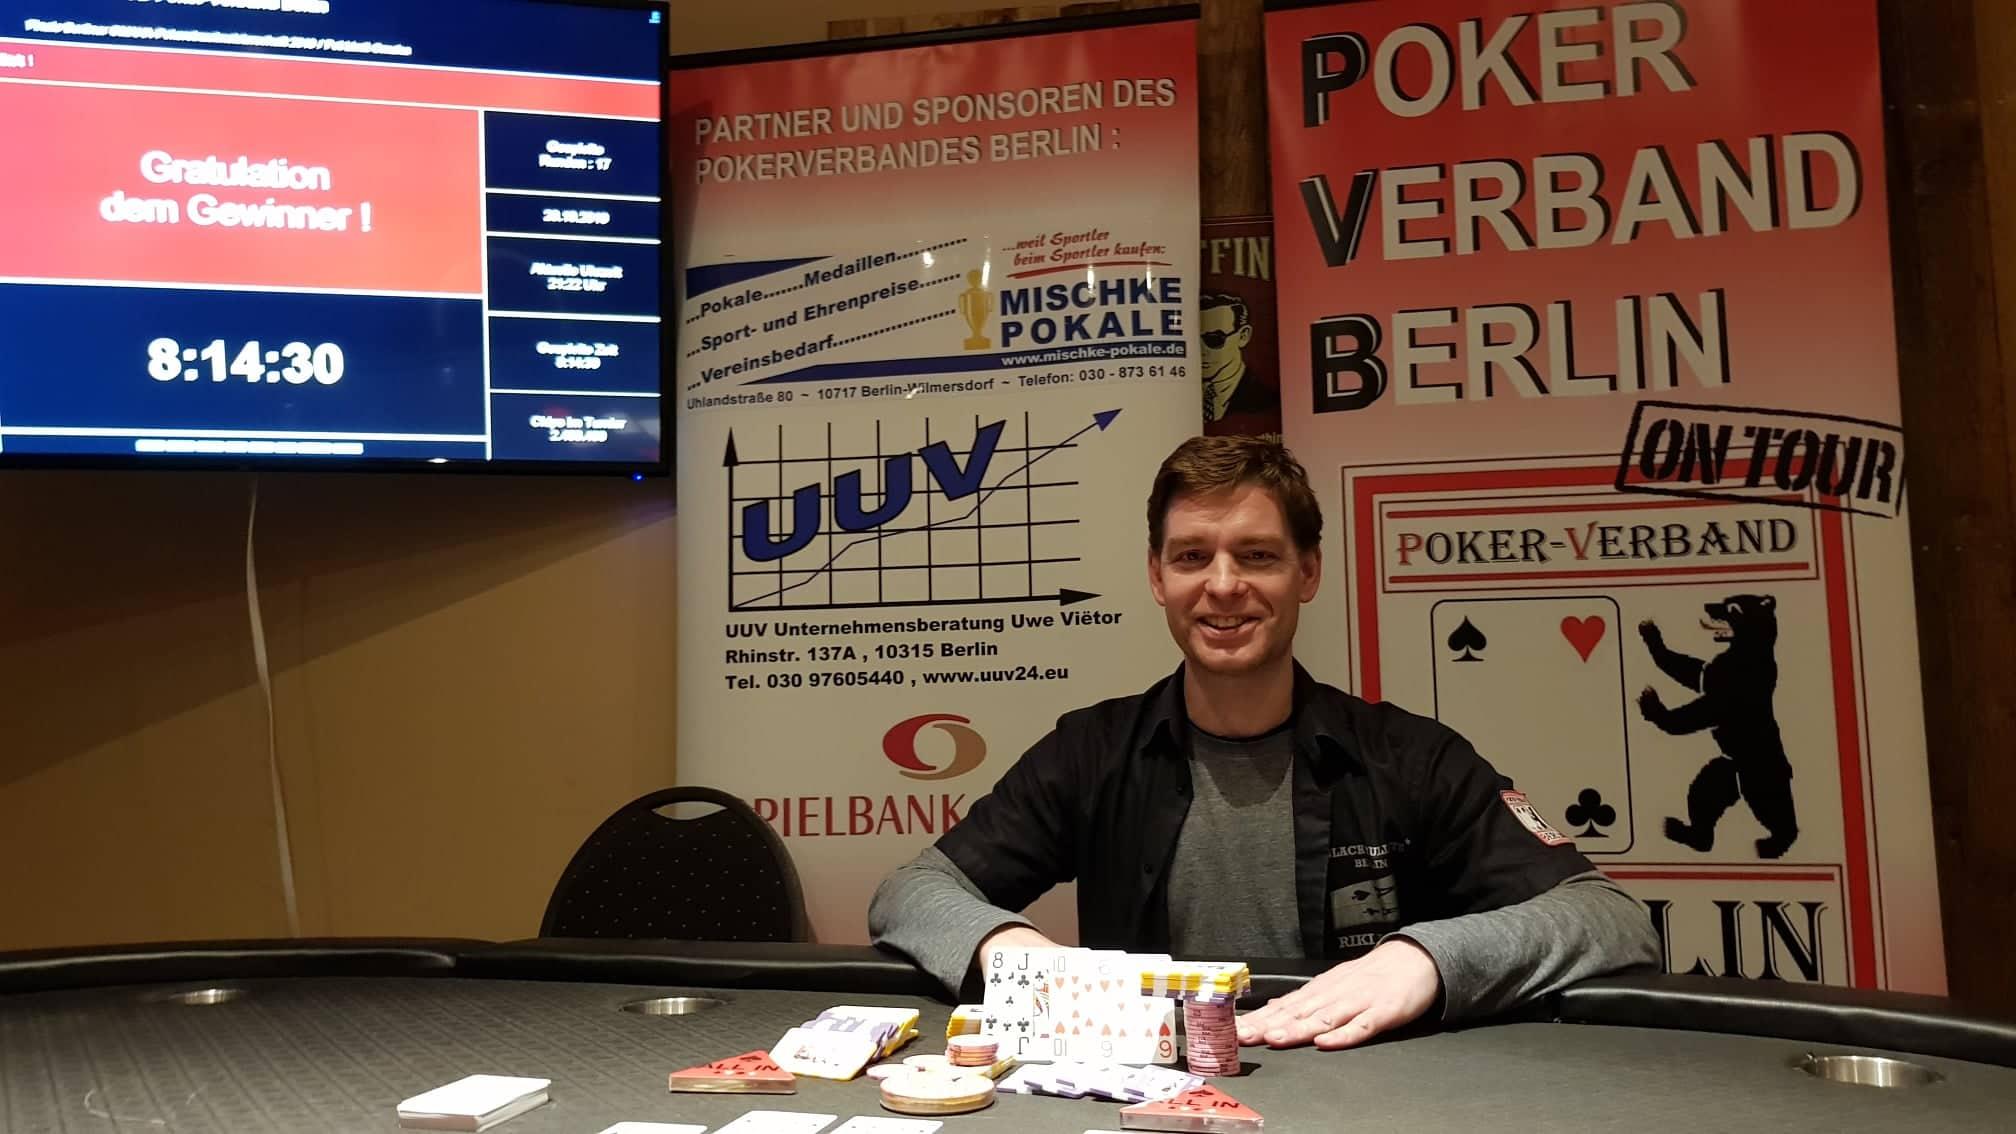 Finale der PVB-Omaha-Pokereinzelmeisterschaft 2019 / Der Sieger